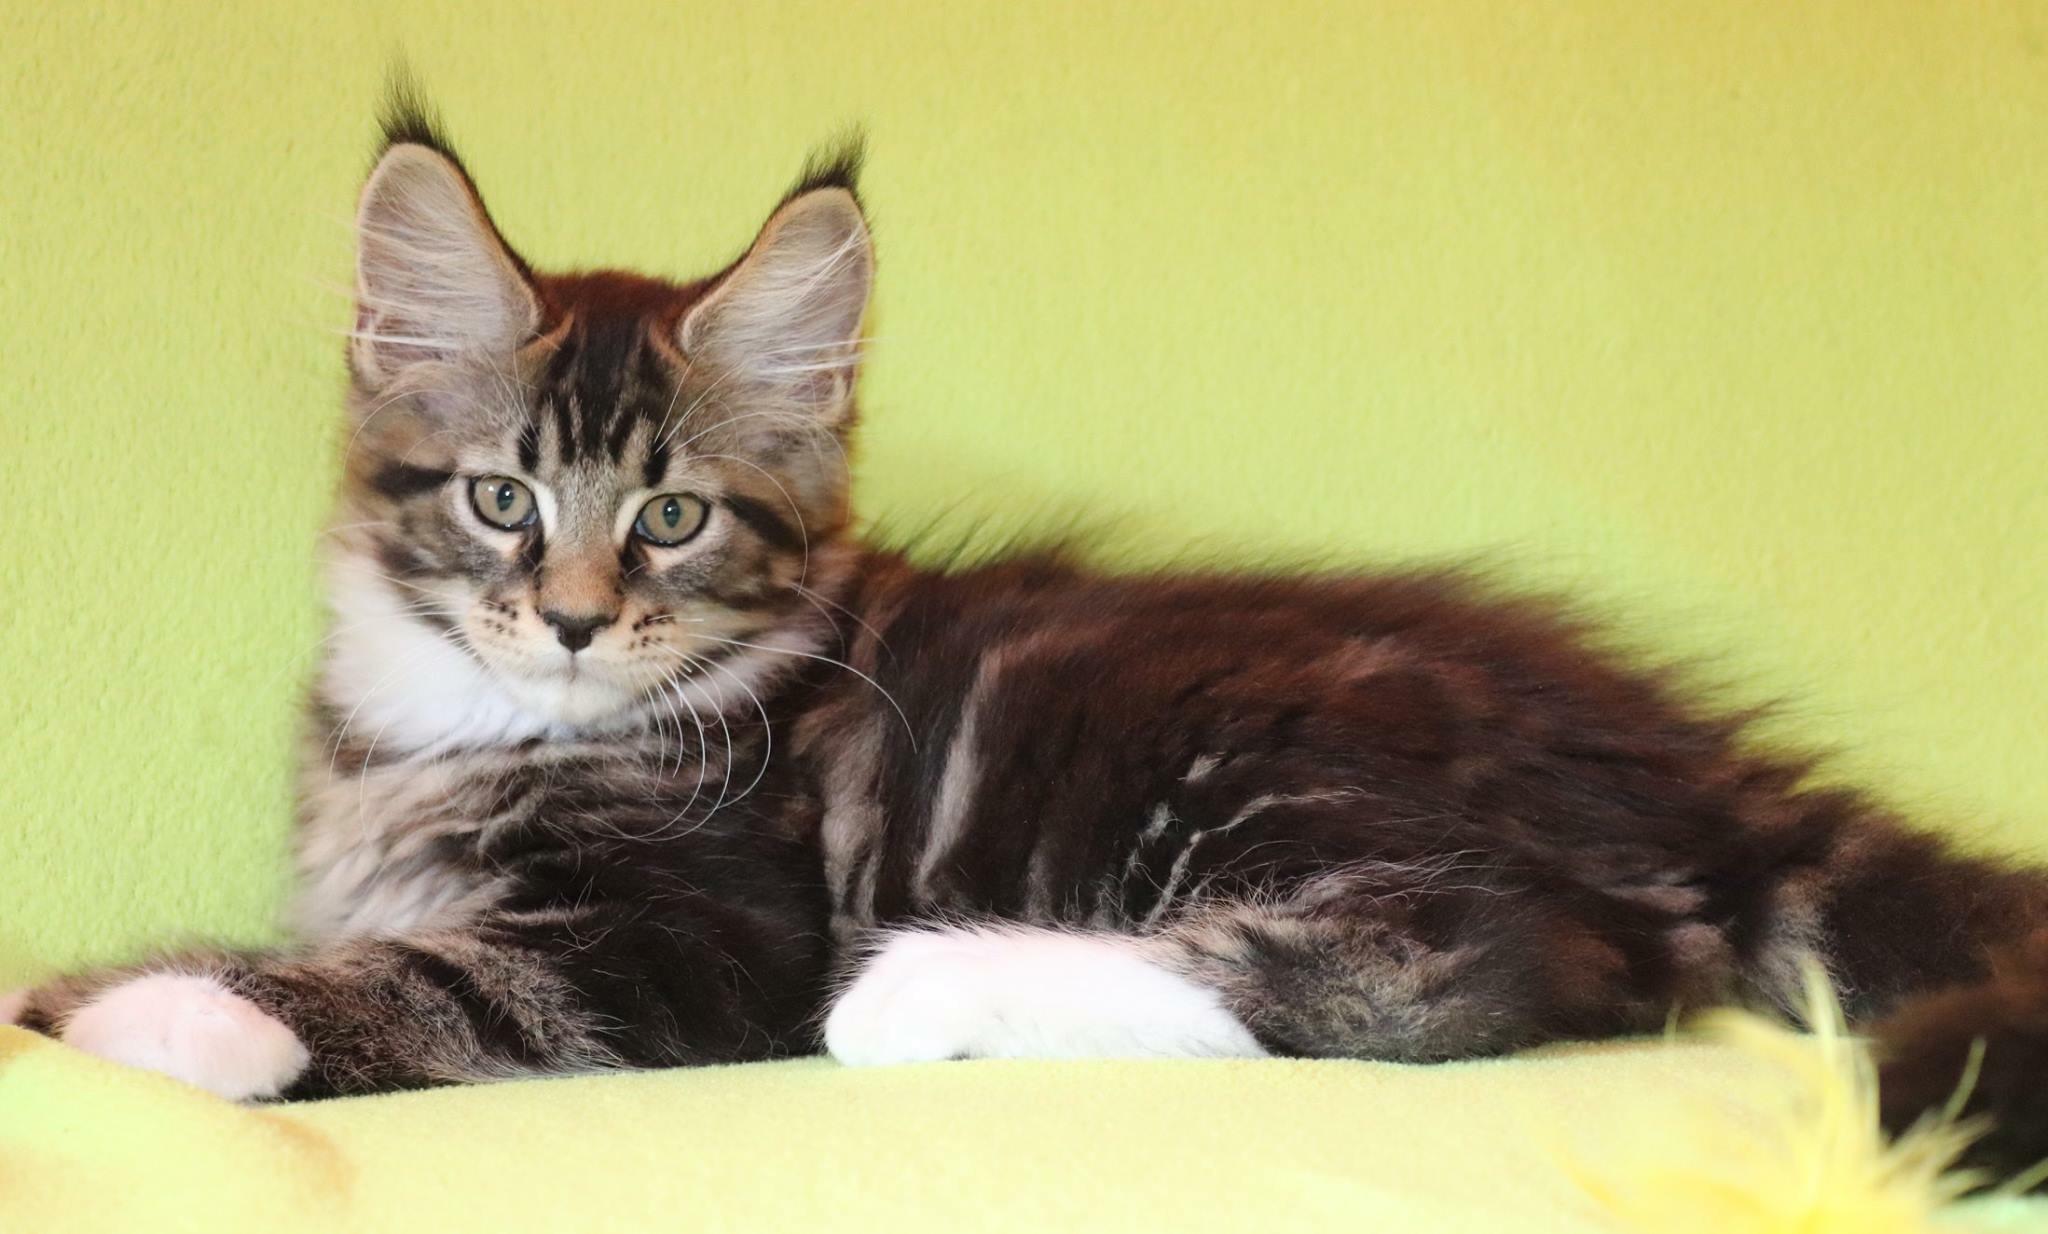 fotka kočky VRH F: FILIP von Erillian*CZ 👦🏻